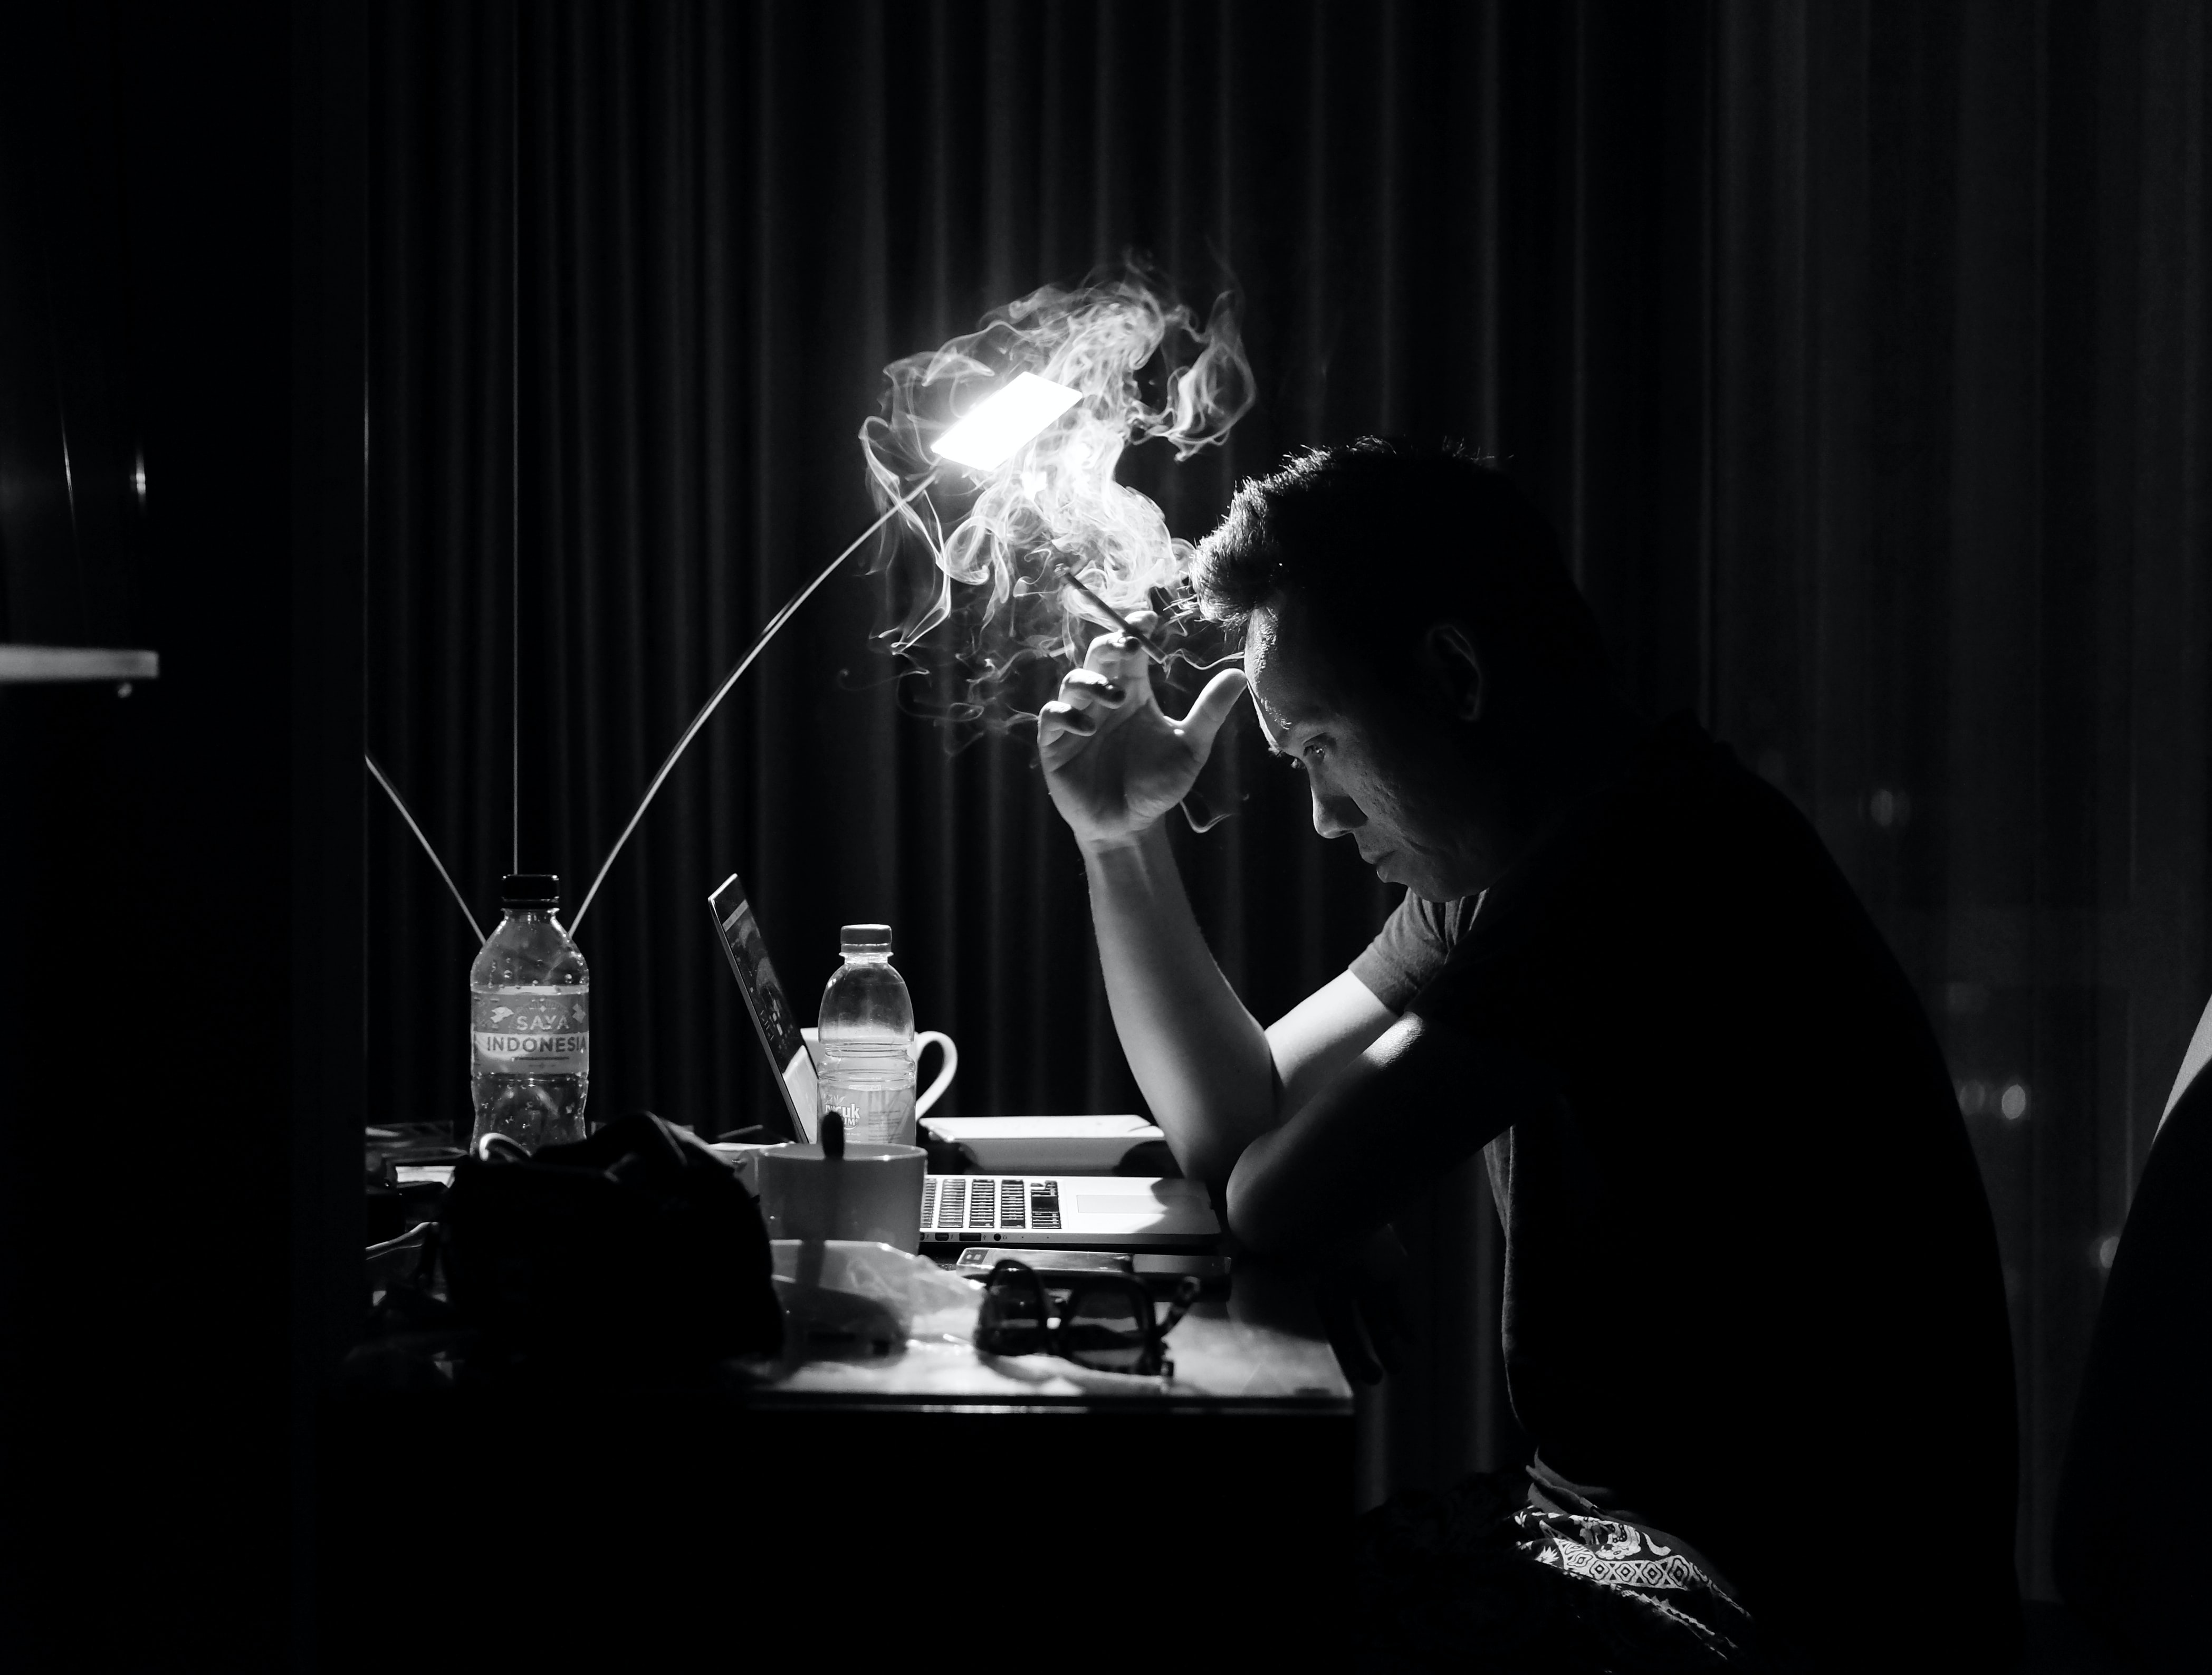 A man sitting at his desk, staring at his computer, smoking a cigarette